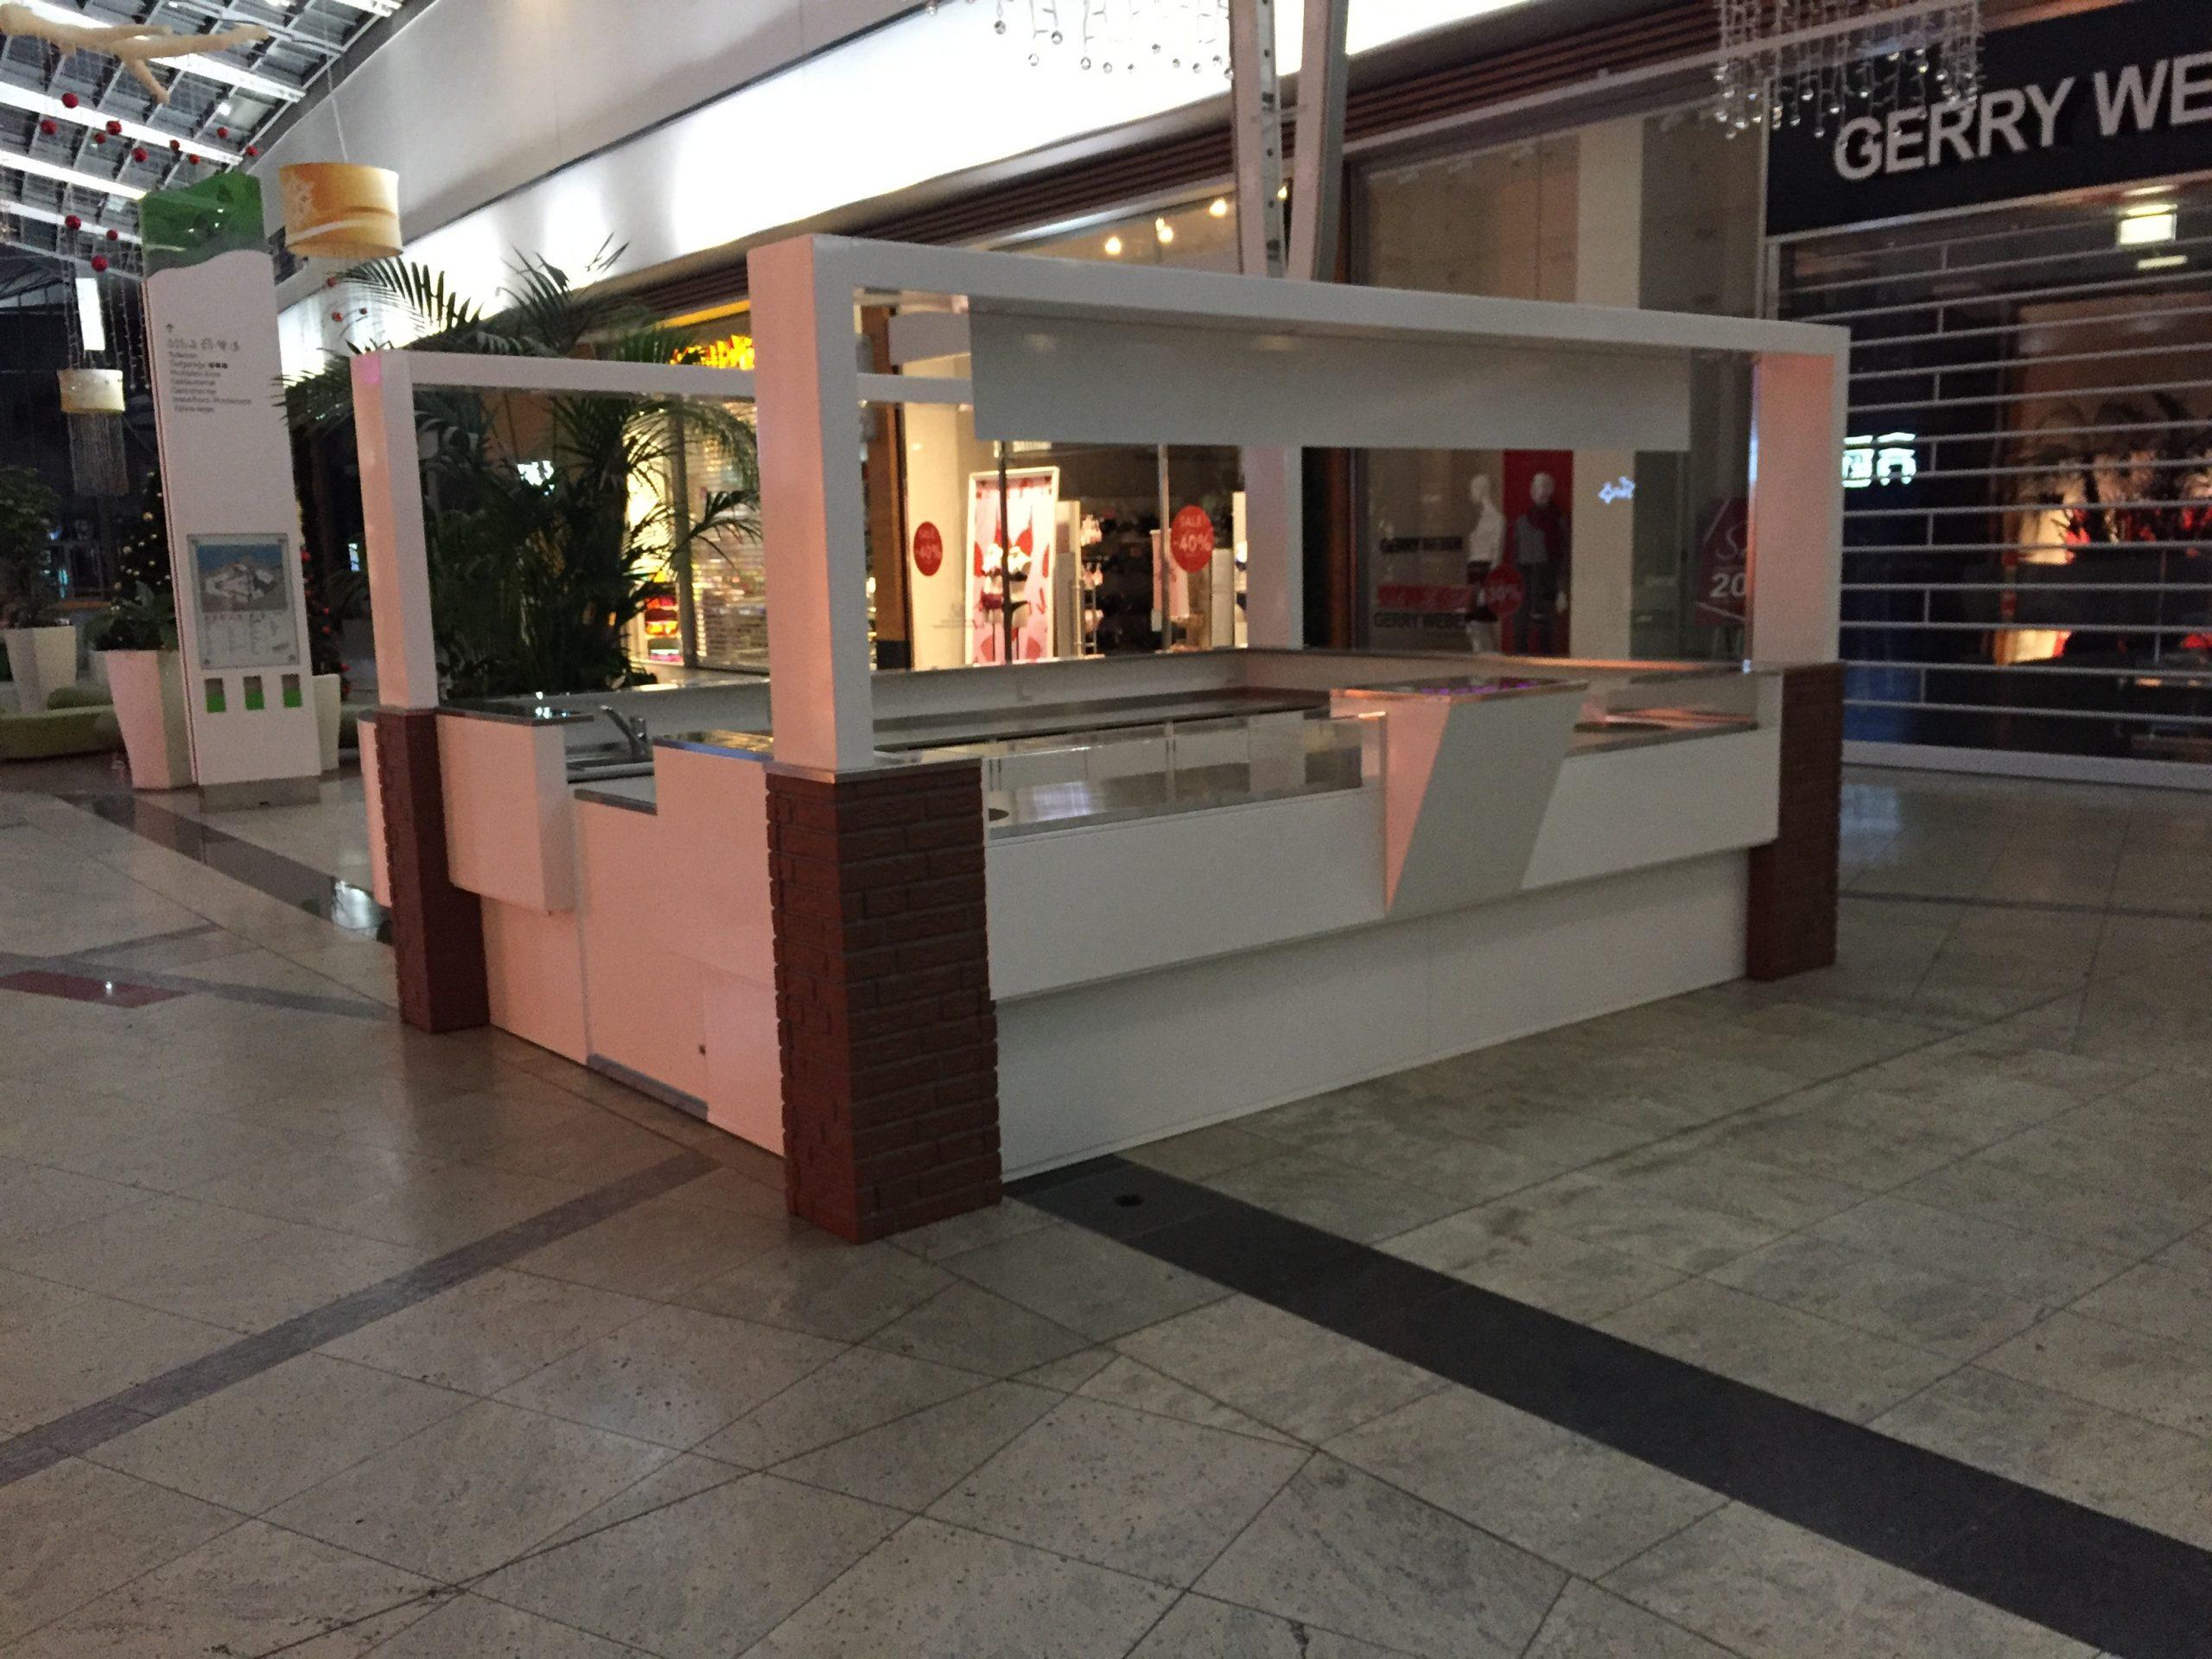 Verkaufsstand Mall Verkaufskiosk Indoor Pavillon Kiosk